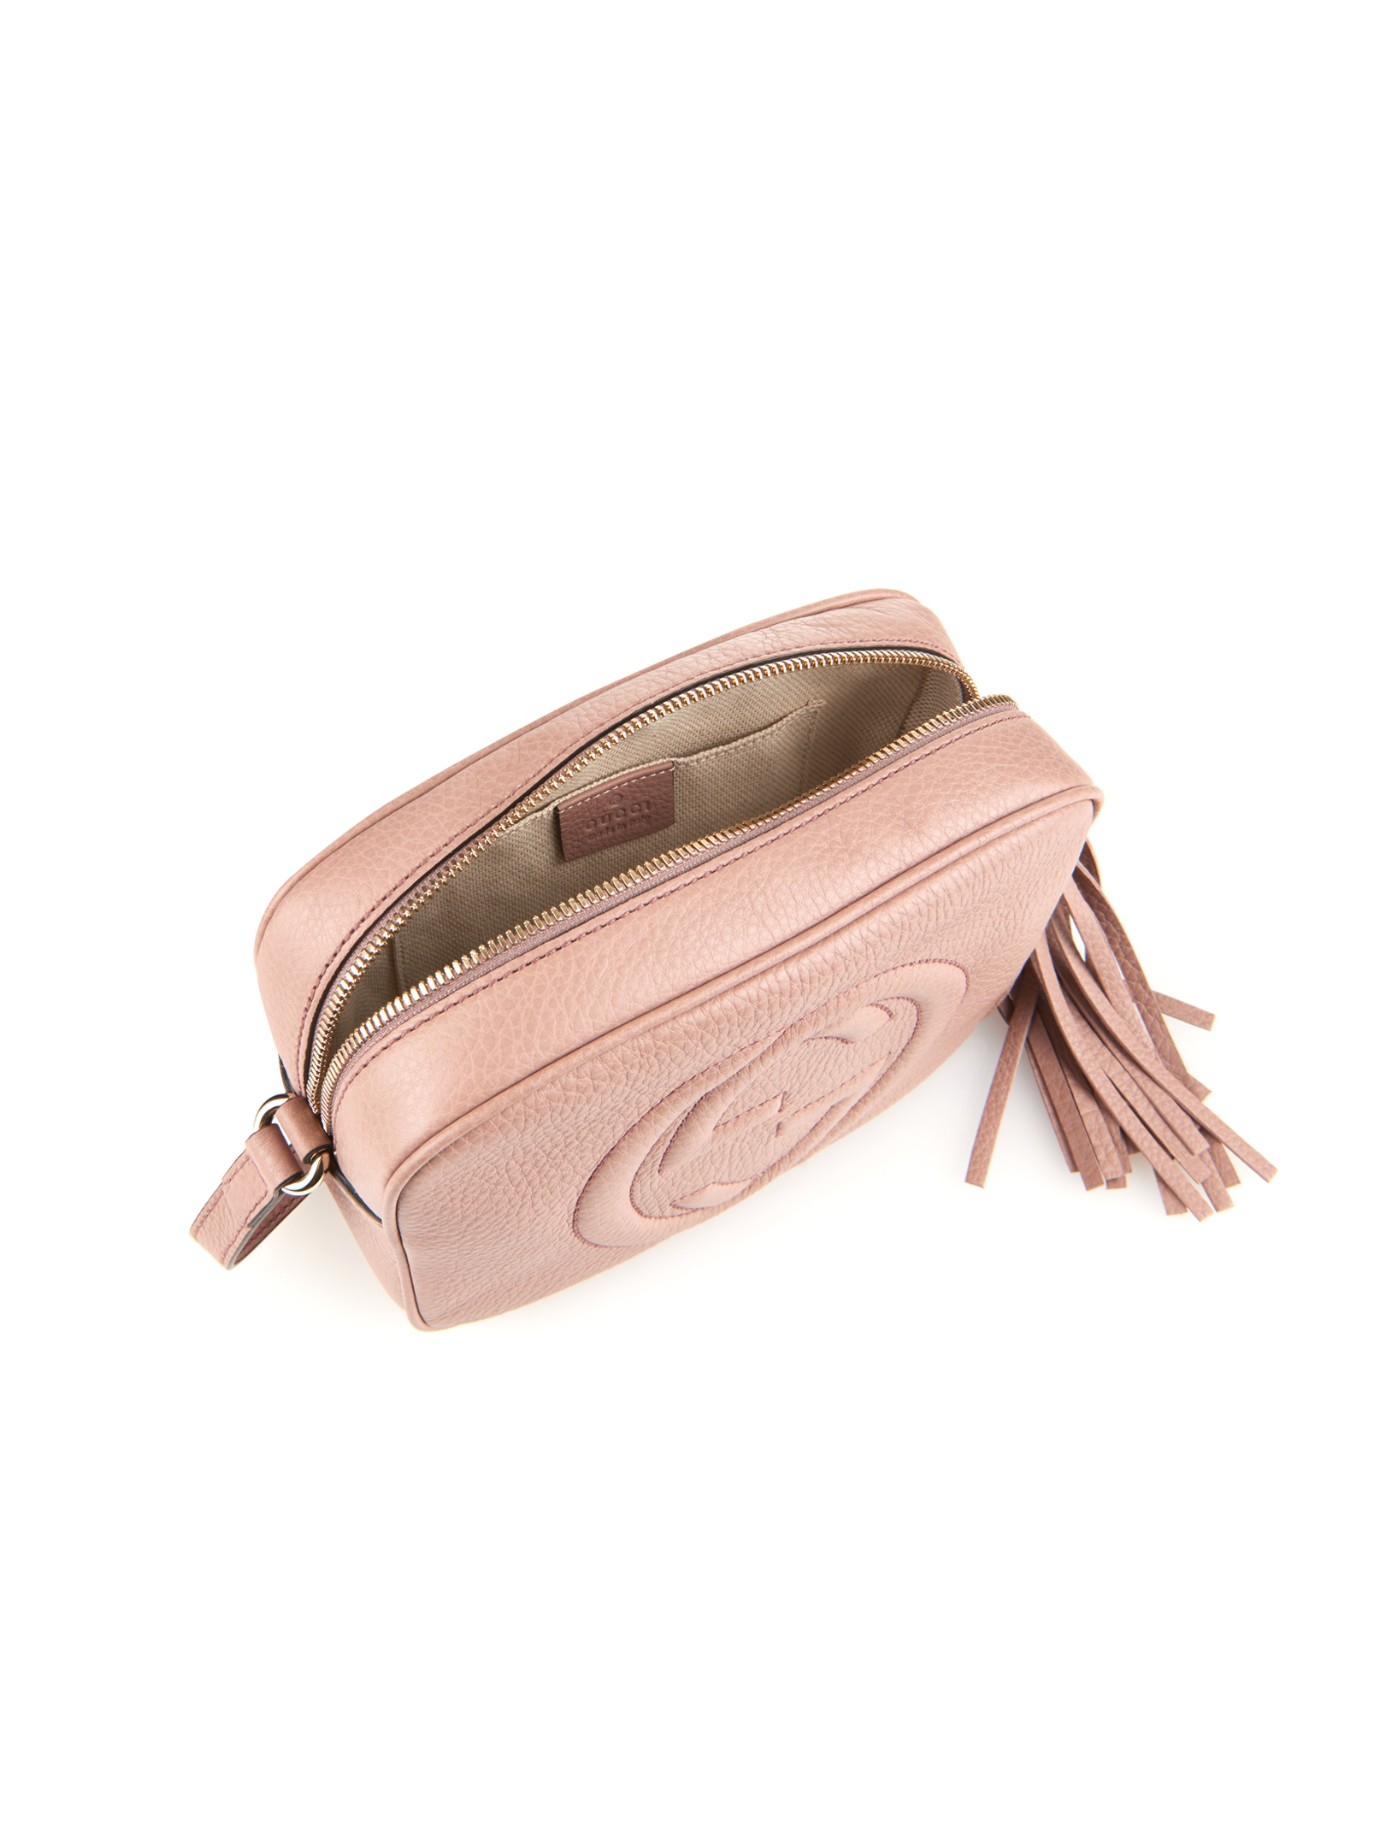 gucci blush pink bag